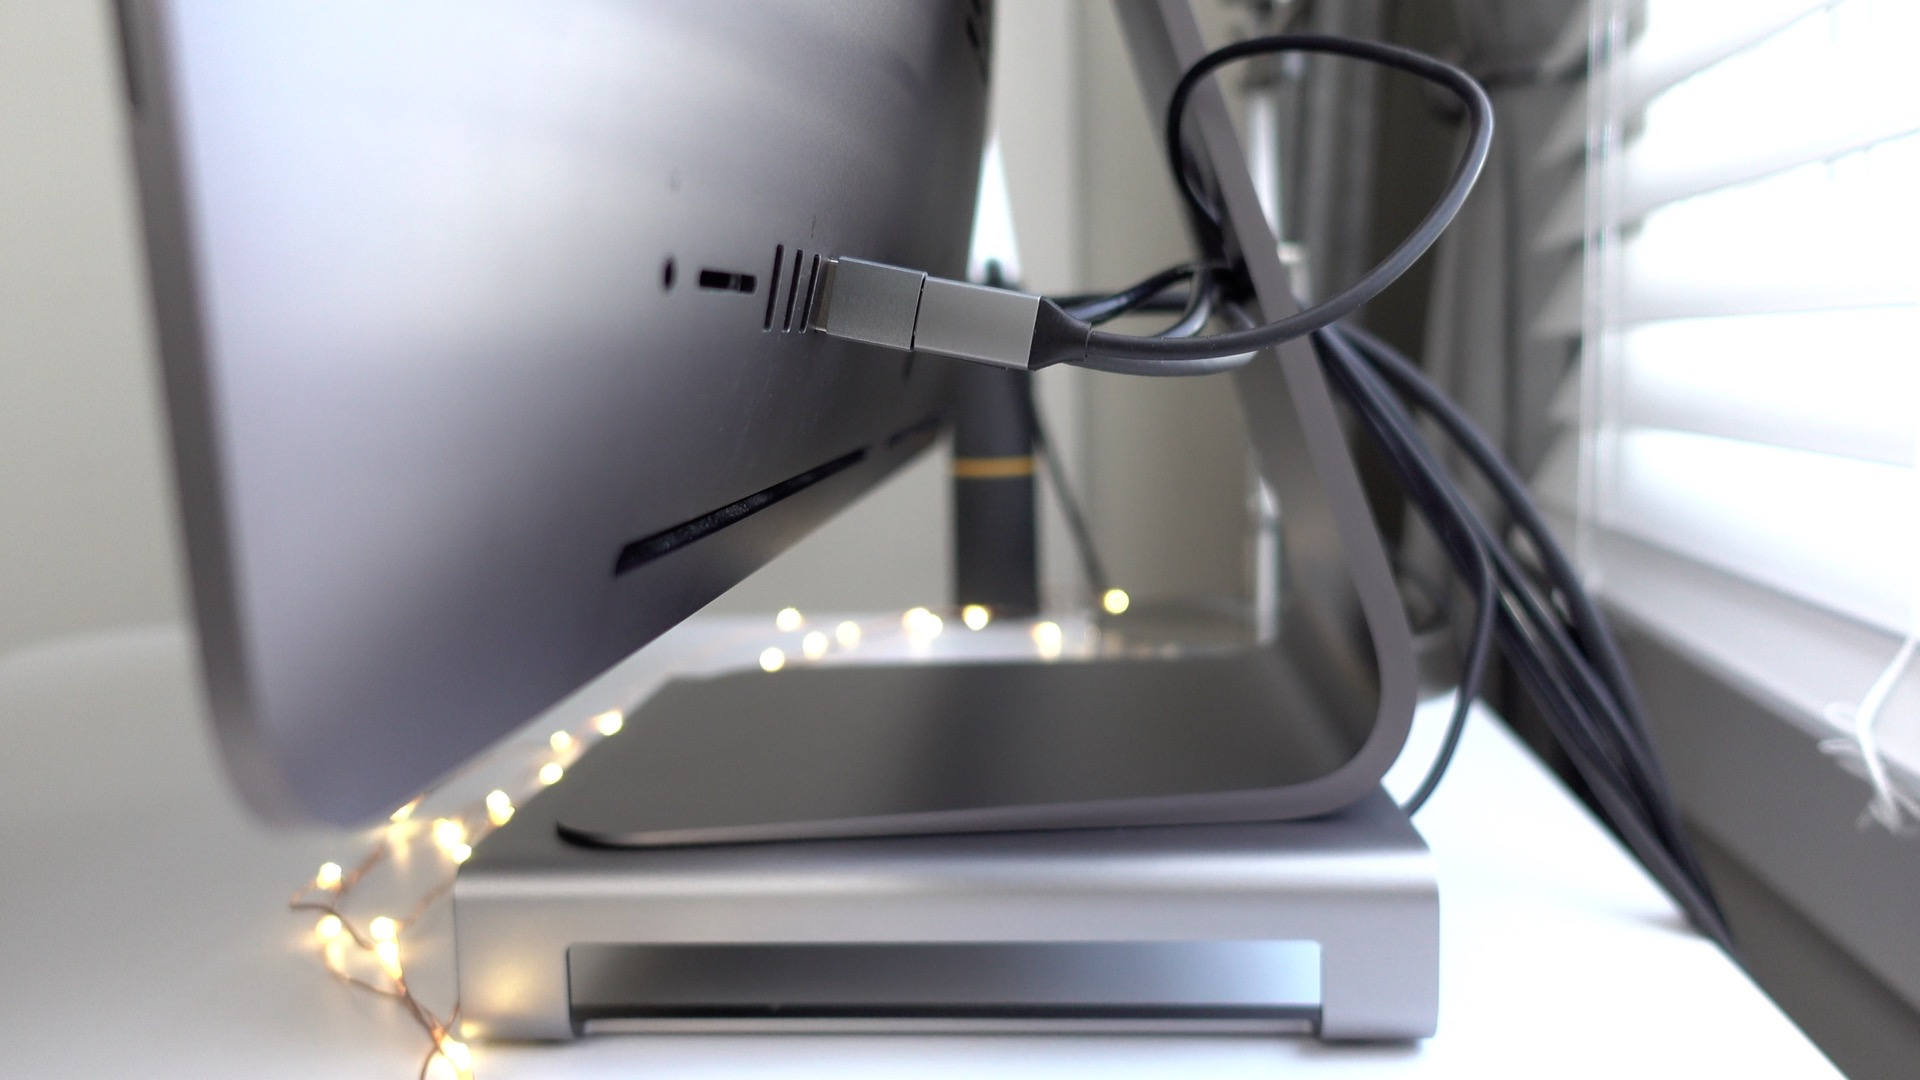 Satechi iMac Stand hub connecting to iMac Pro via USB